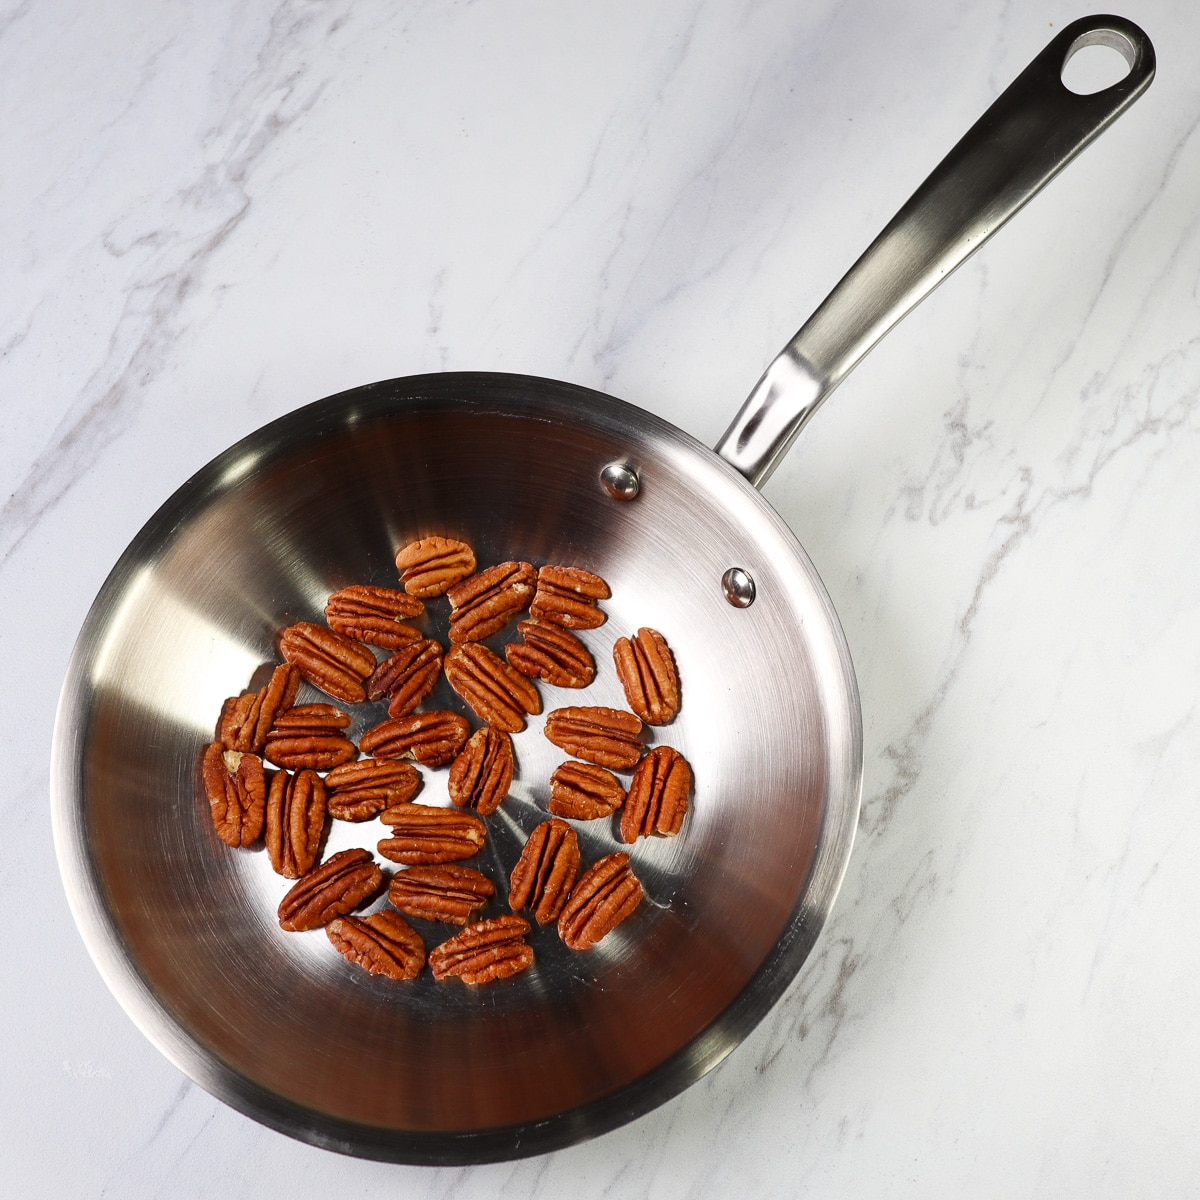 raw pecans in a frying pan